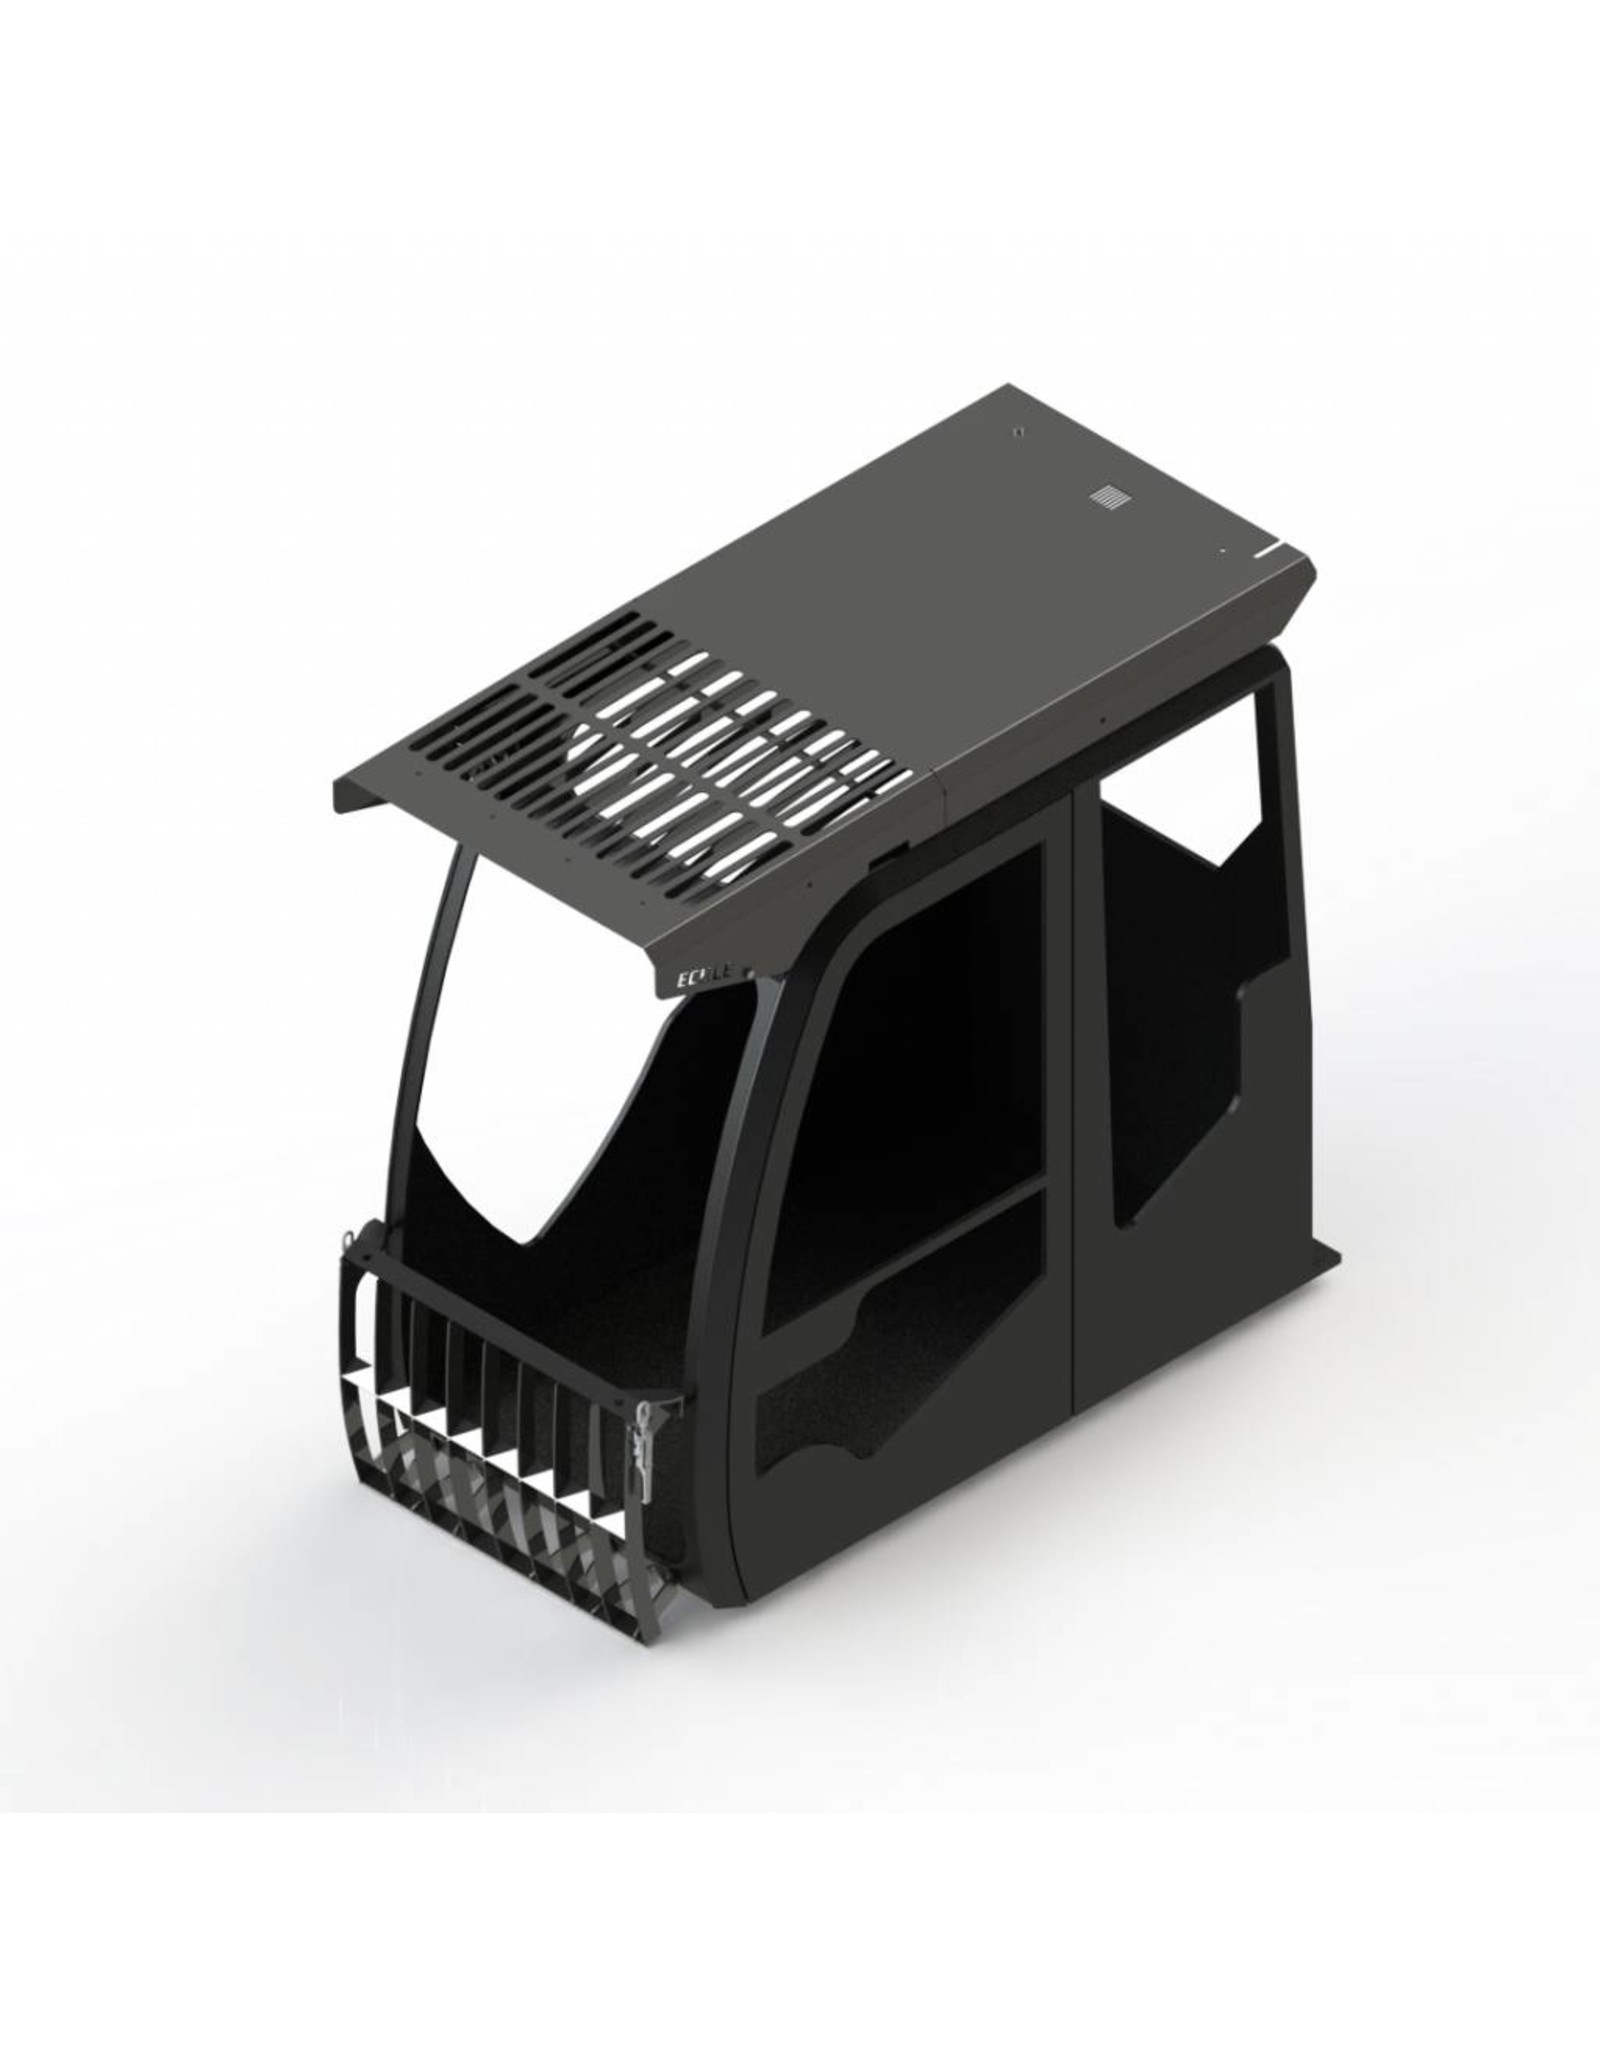 Echle Hartstahl GmbH FOPS für Sany SY235C